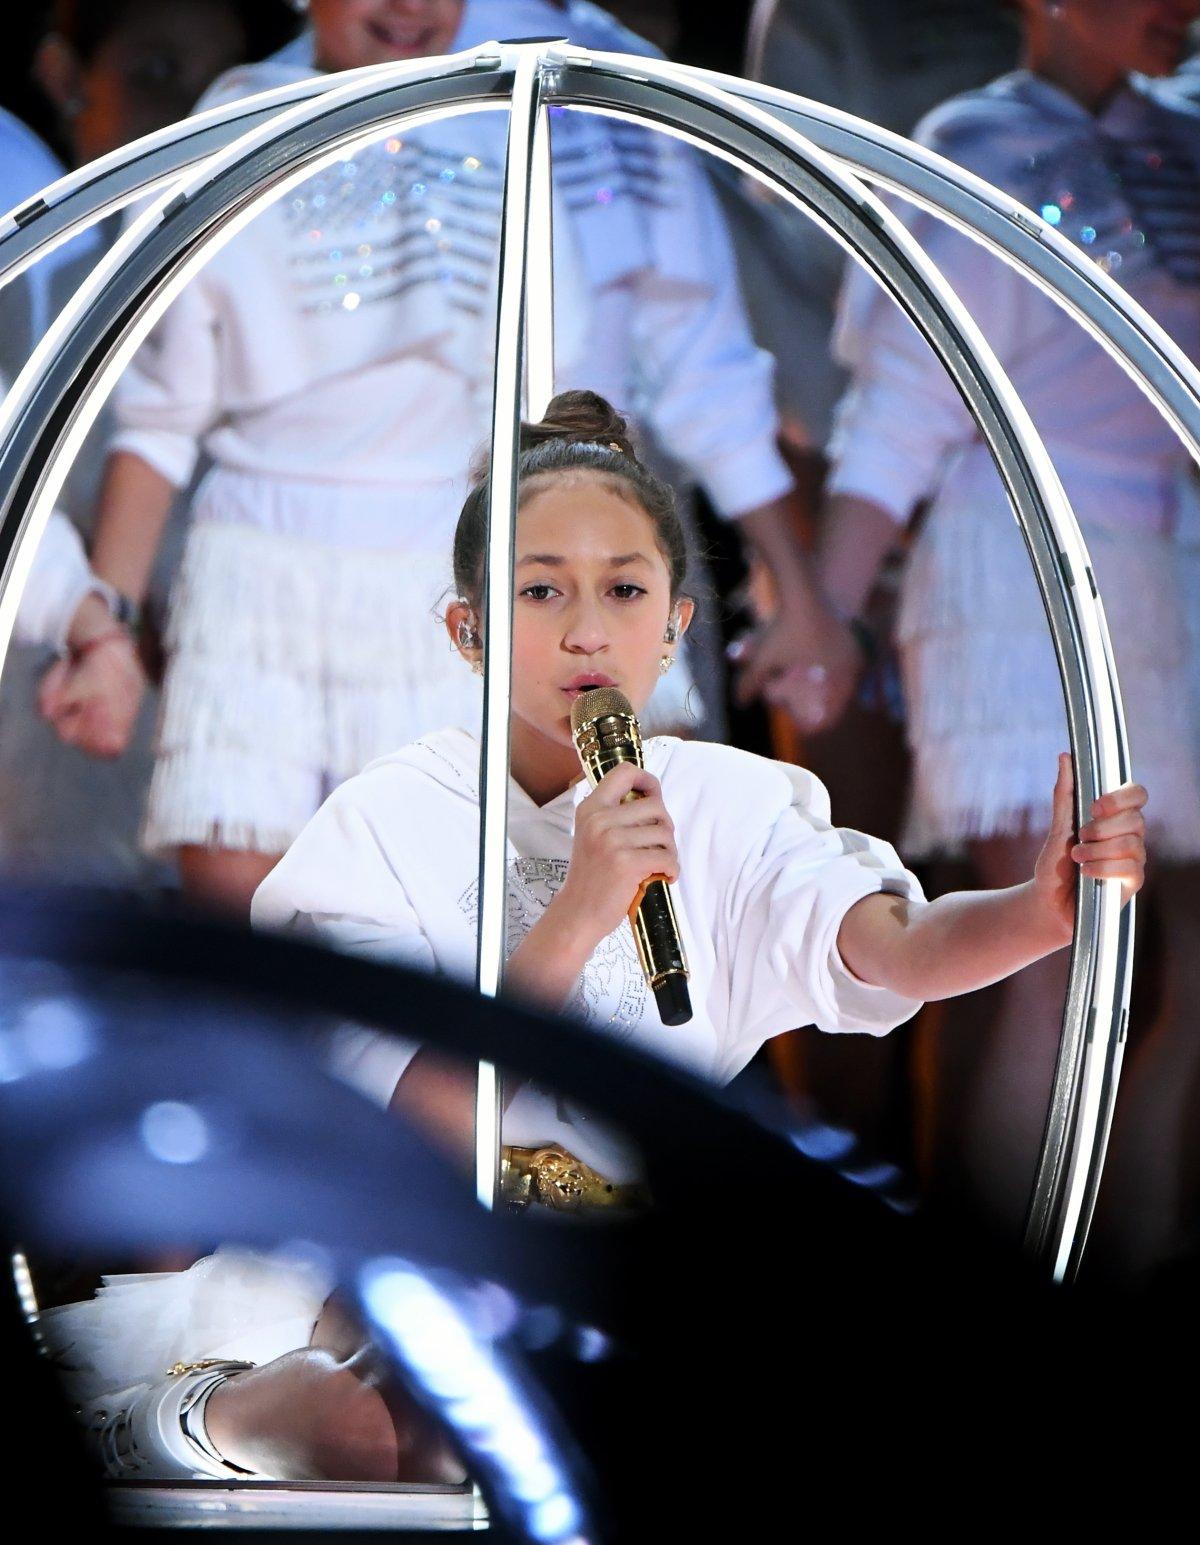 Jennifer Lopez Reflects On Super Bowl Halftime Show Kids In Cages Moment National Globalnews Ca